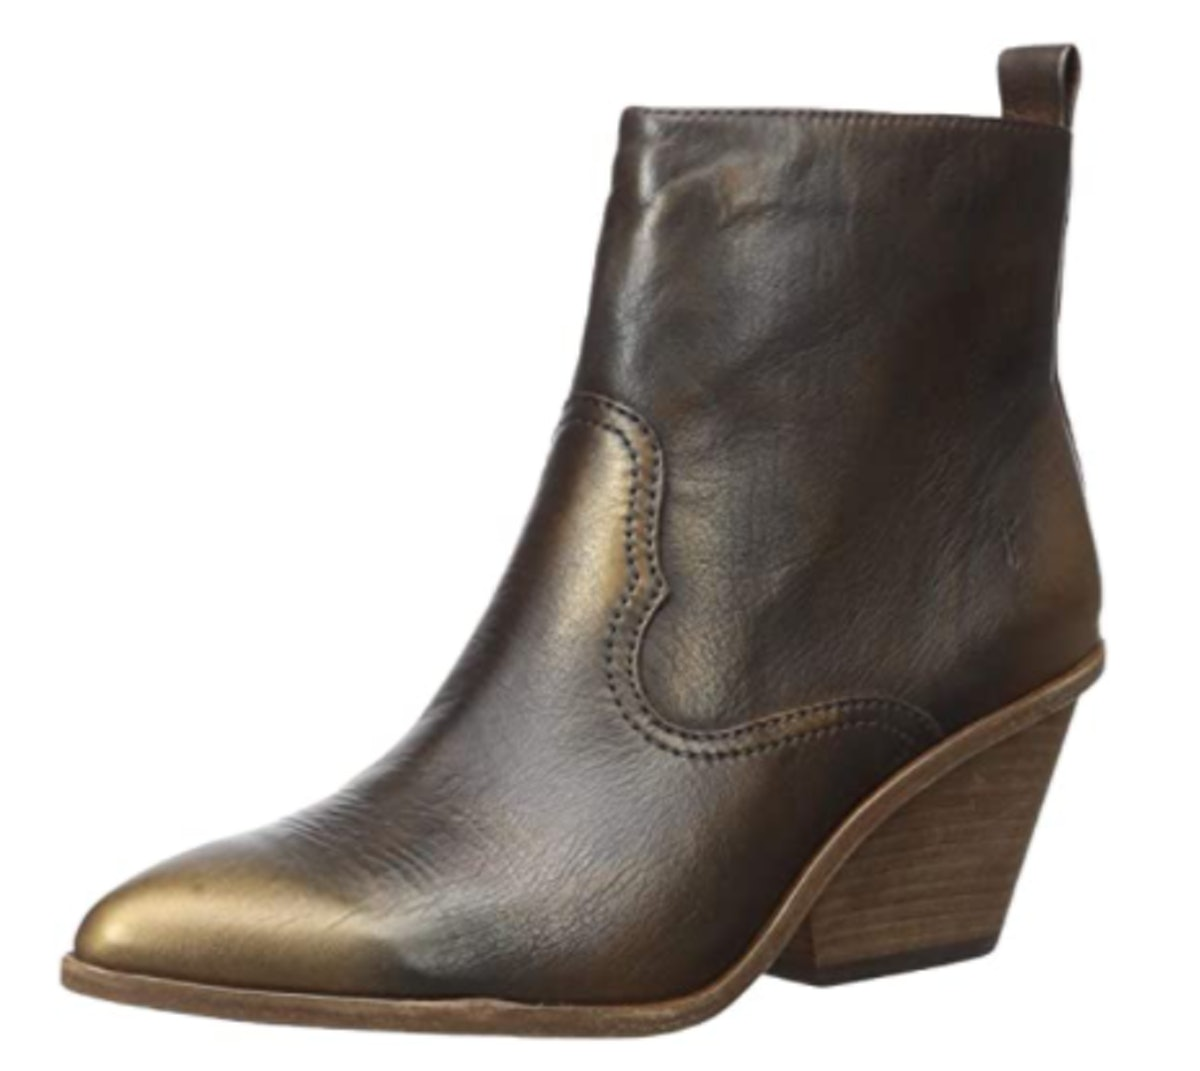 Frye Amado Wedge Ankle Boot